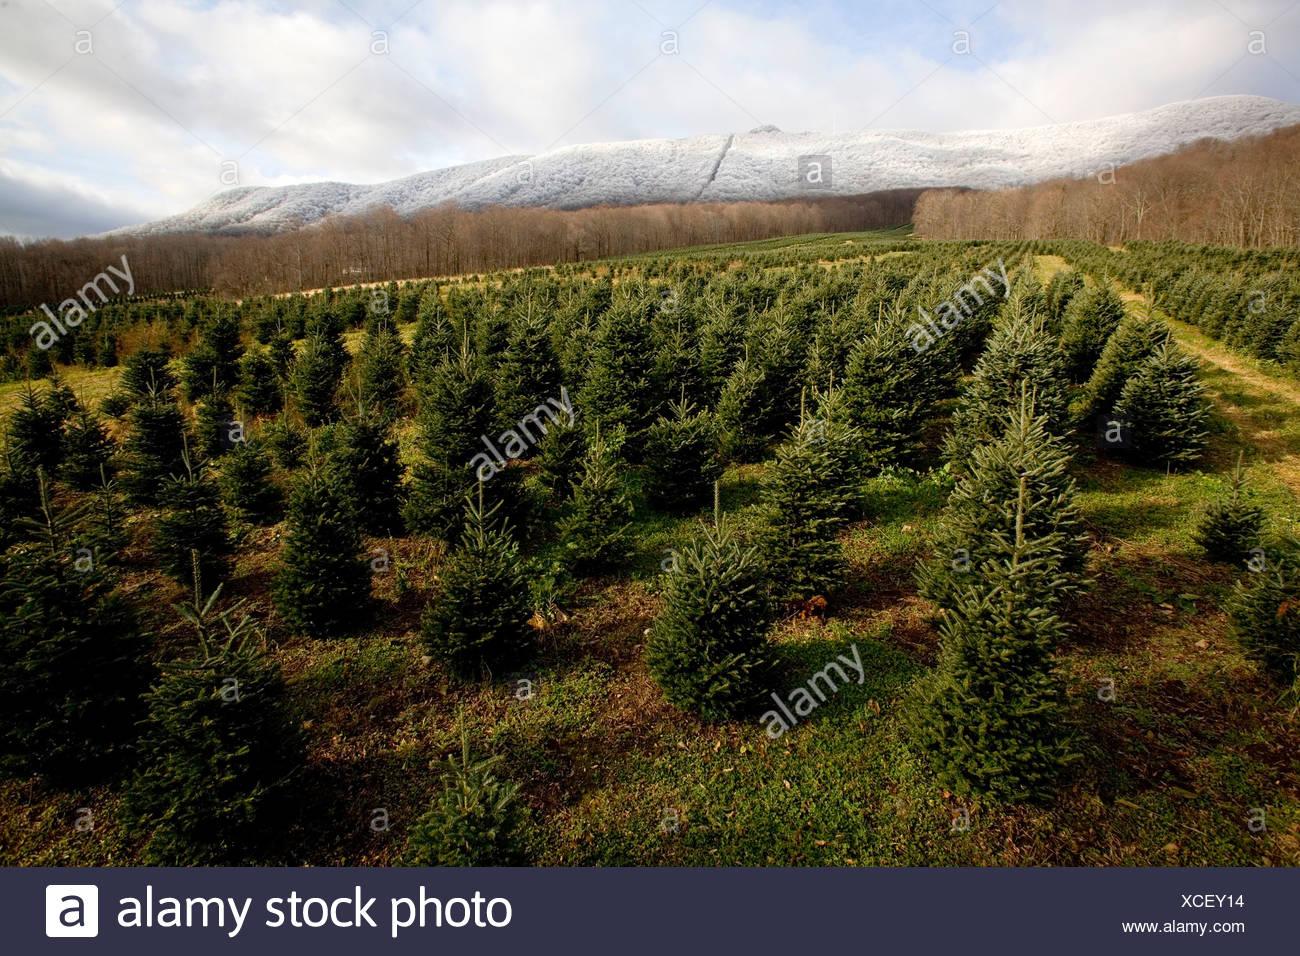 A Christmas Tree Farm In Zionville North Carolina Stock Photo